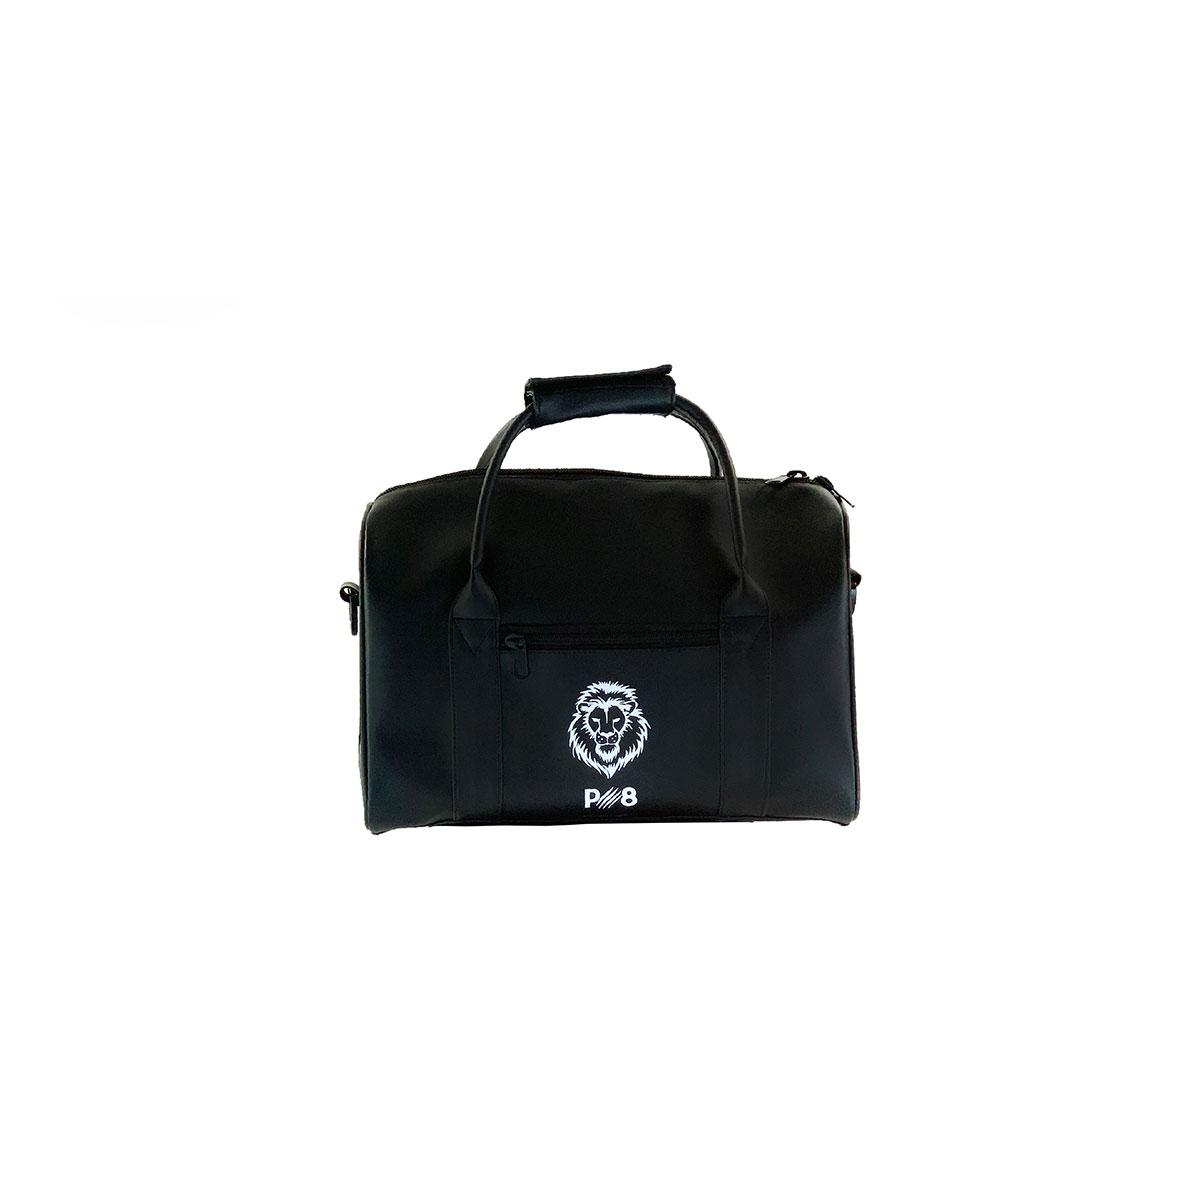 Leather Weekend Holdall Bag  - Black